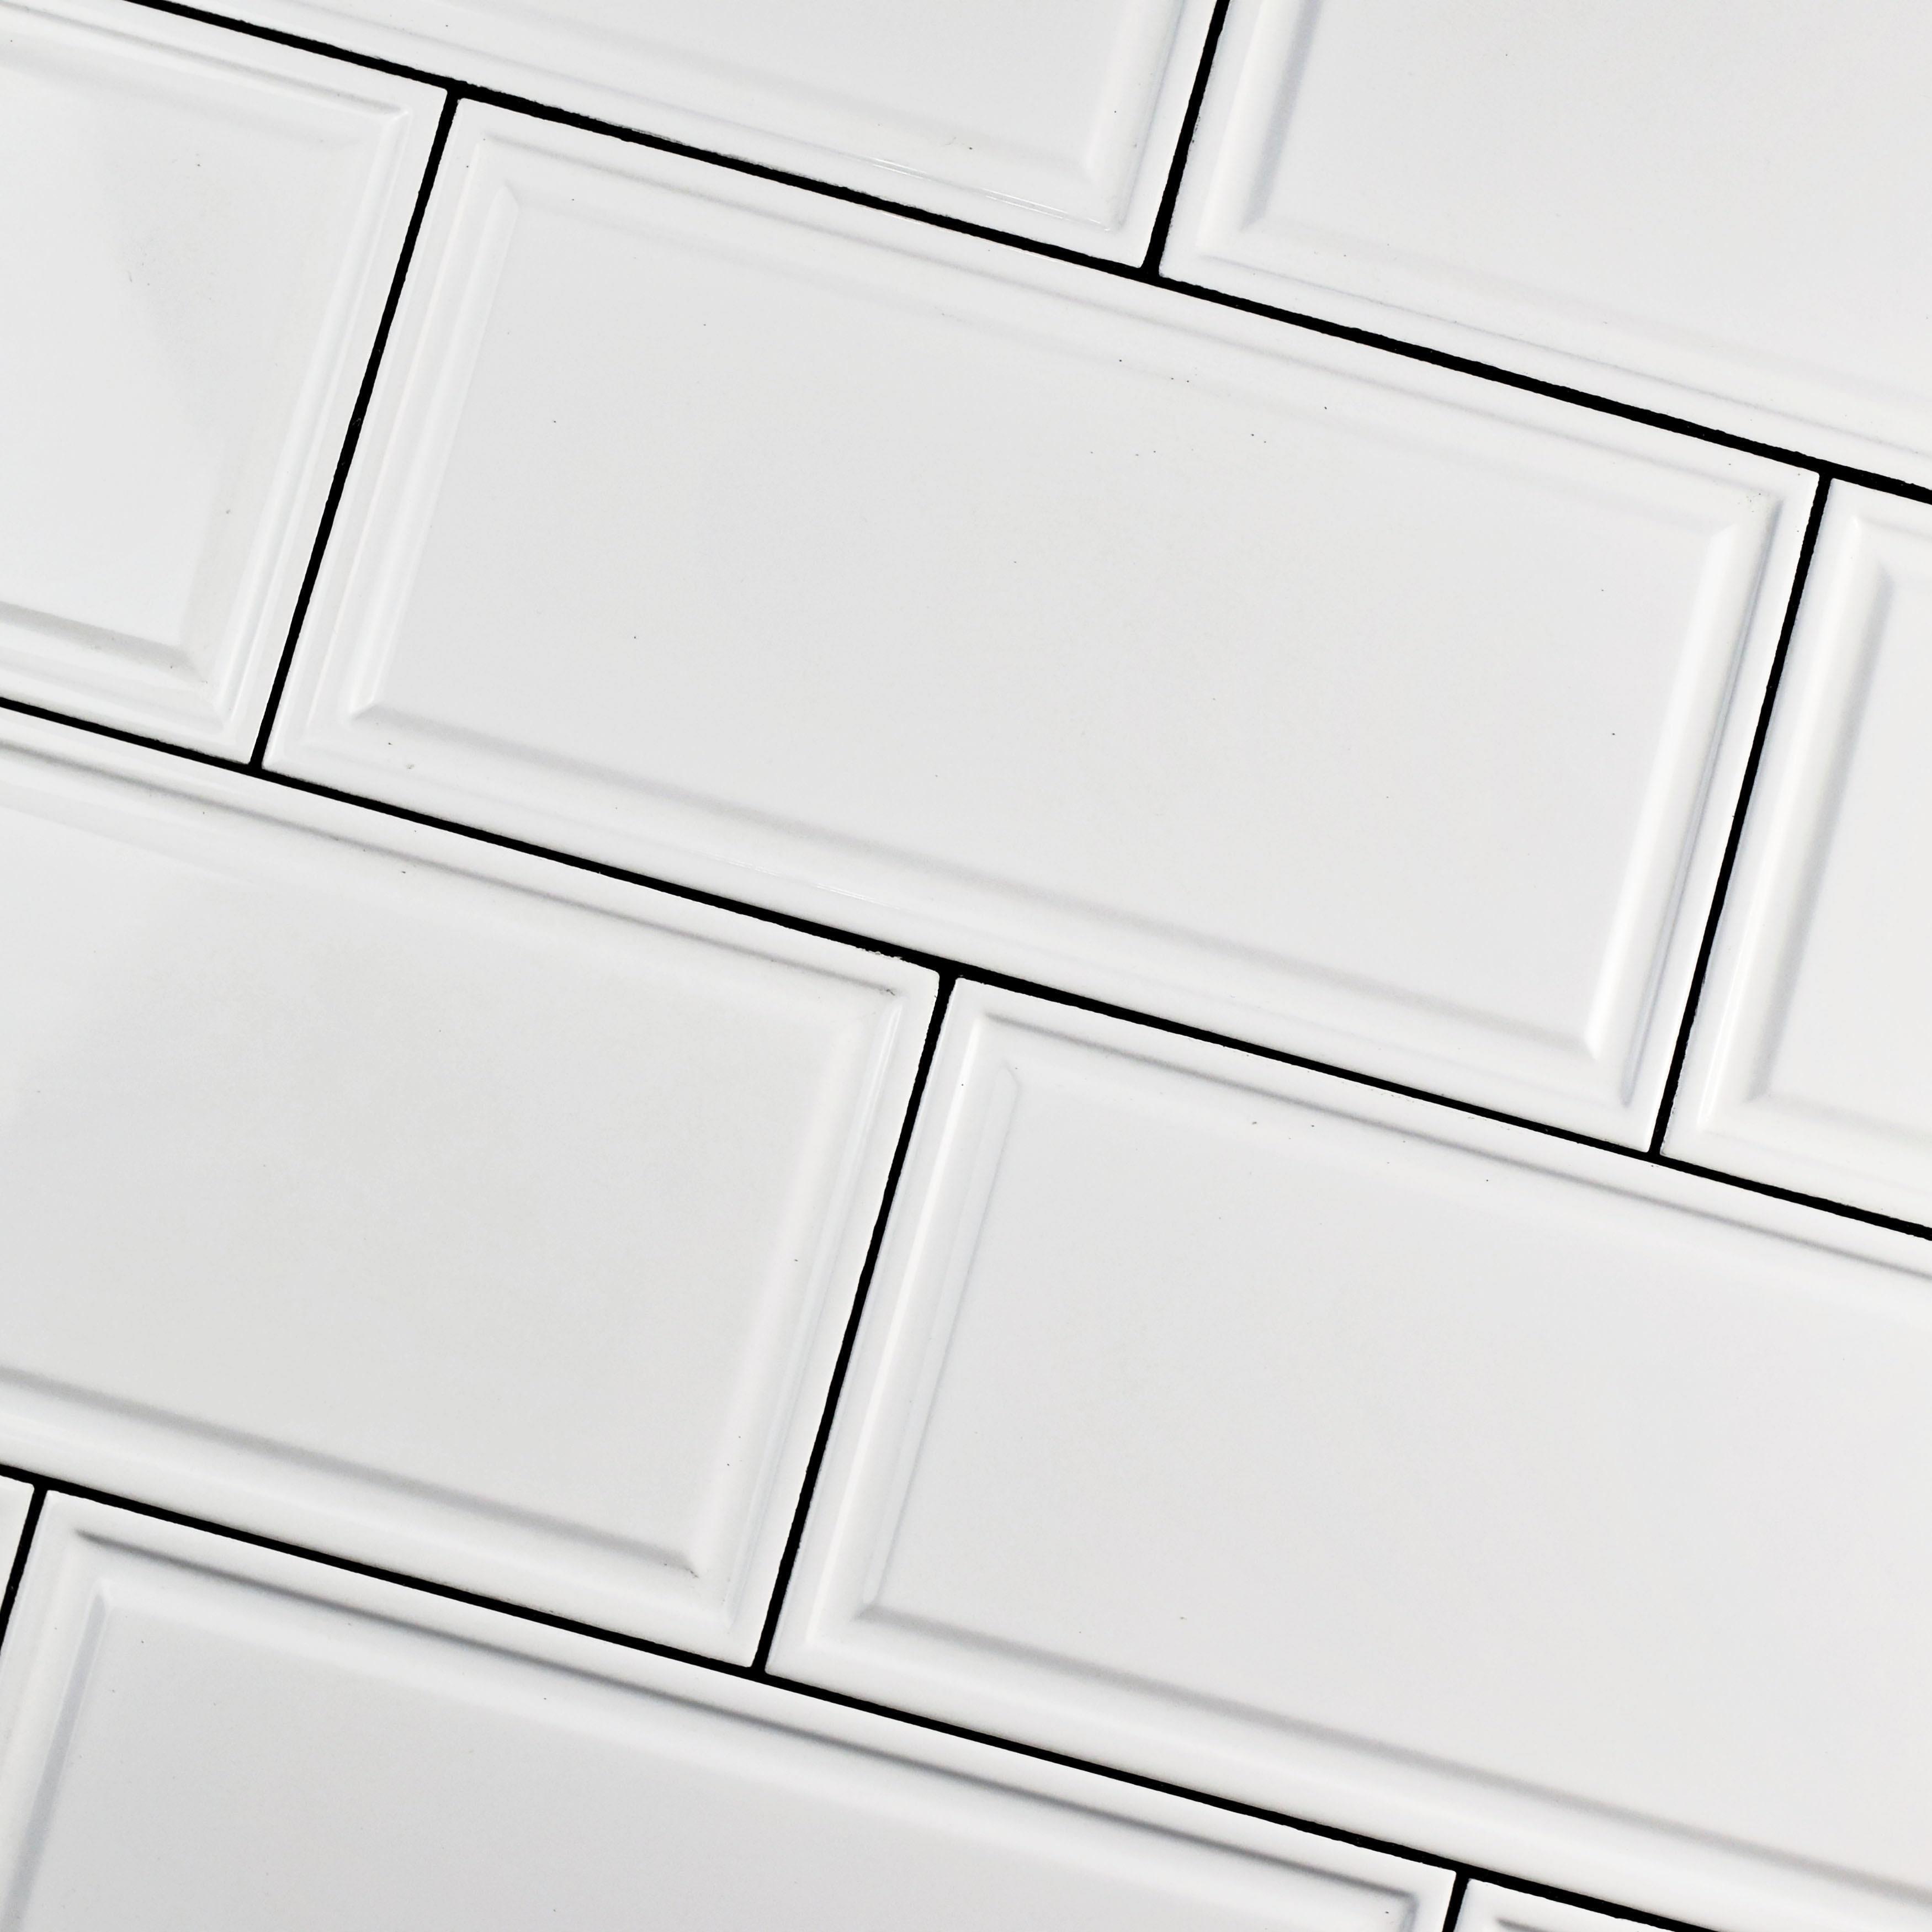 Somertile 6x12 inch dobladillo white ceramic wall tile 22 tiles somertile 6x12 inch dobladillo white ceramic wall tile 22 tiles1076 sqft free shipping today overstock 18037114 dailygadgetfo Images